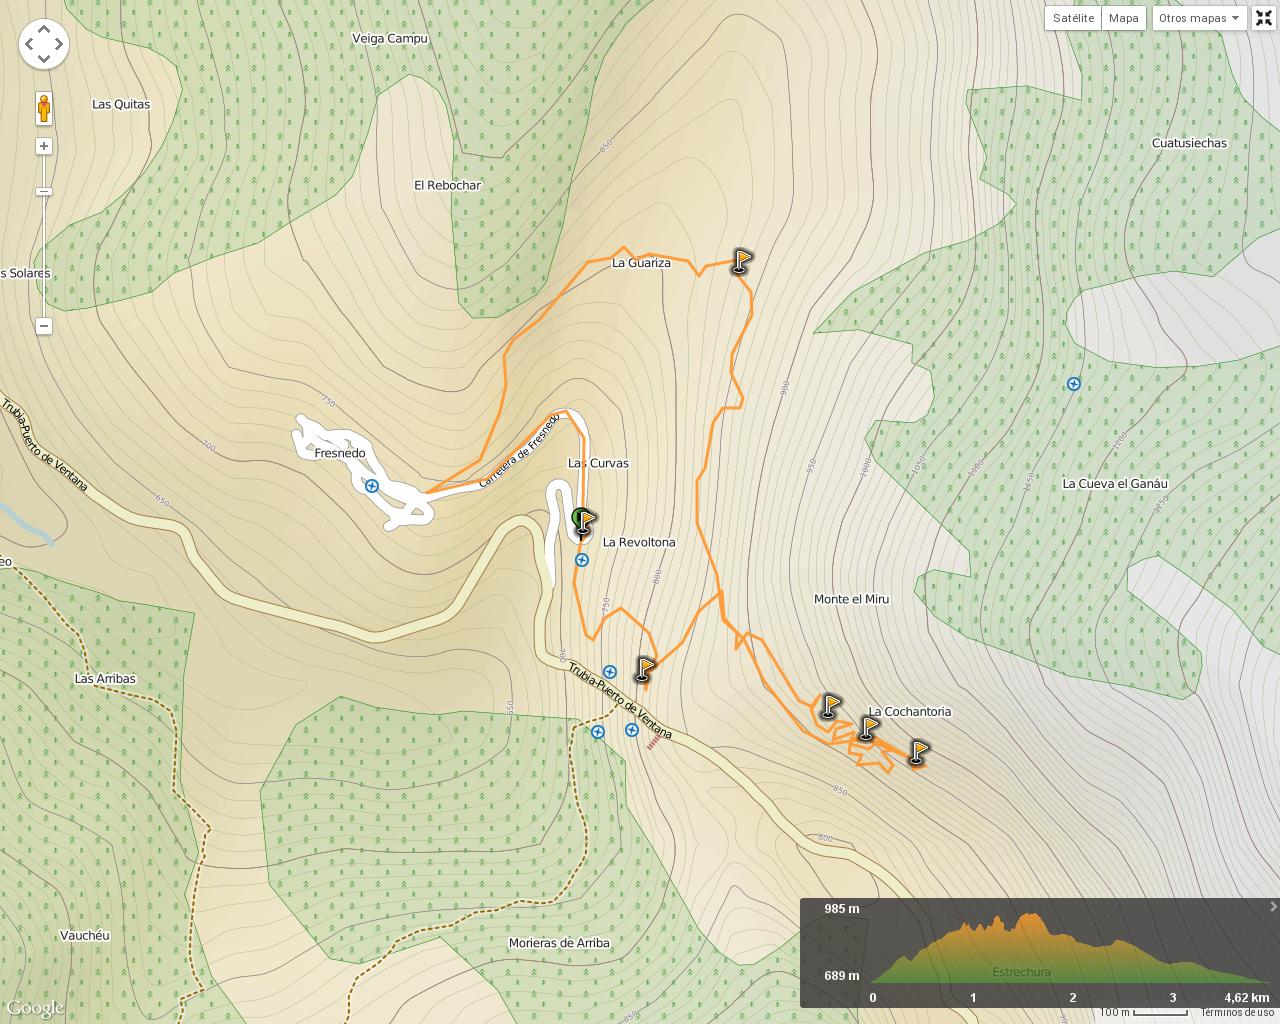 Ruta Pinturas Rupestres Fresnedo: Mapa de la ruta